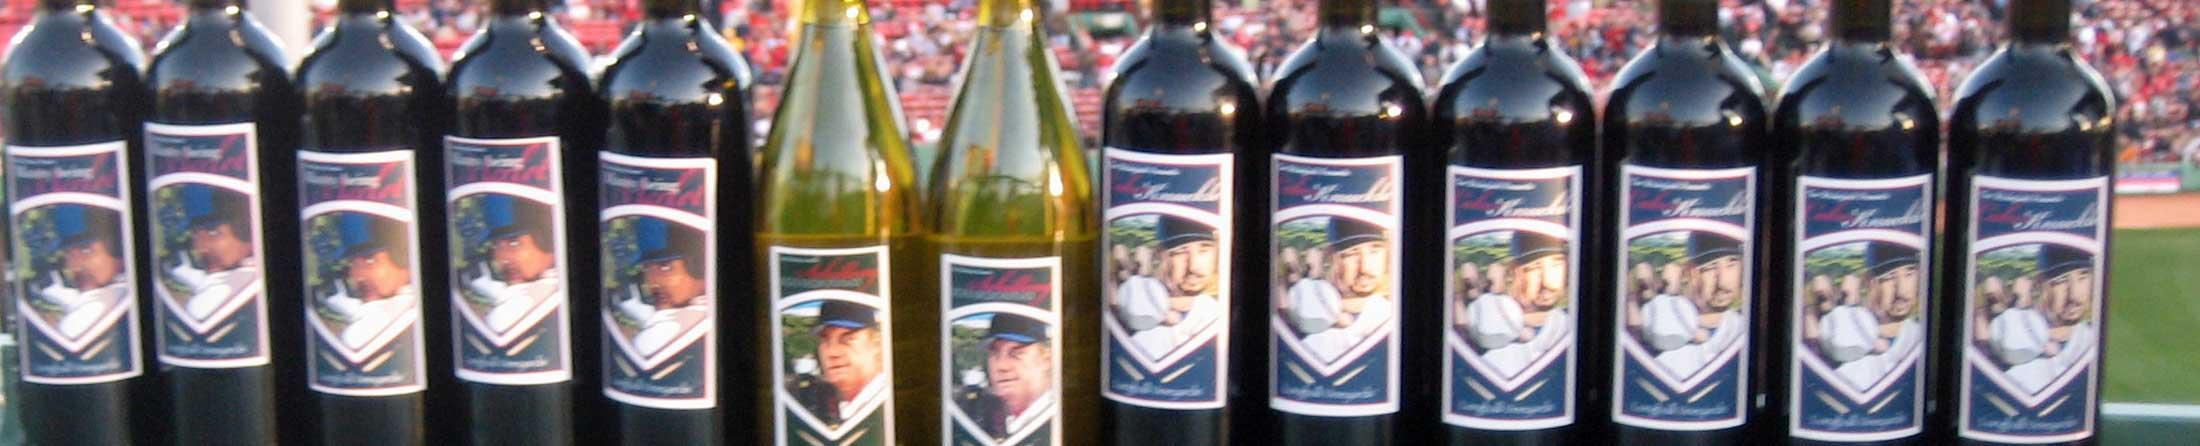 2007 Boston Red Sox Wine Bottles